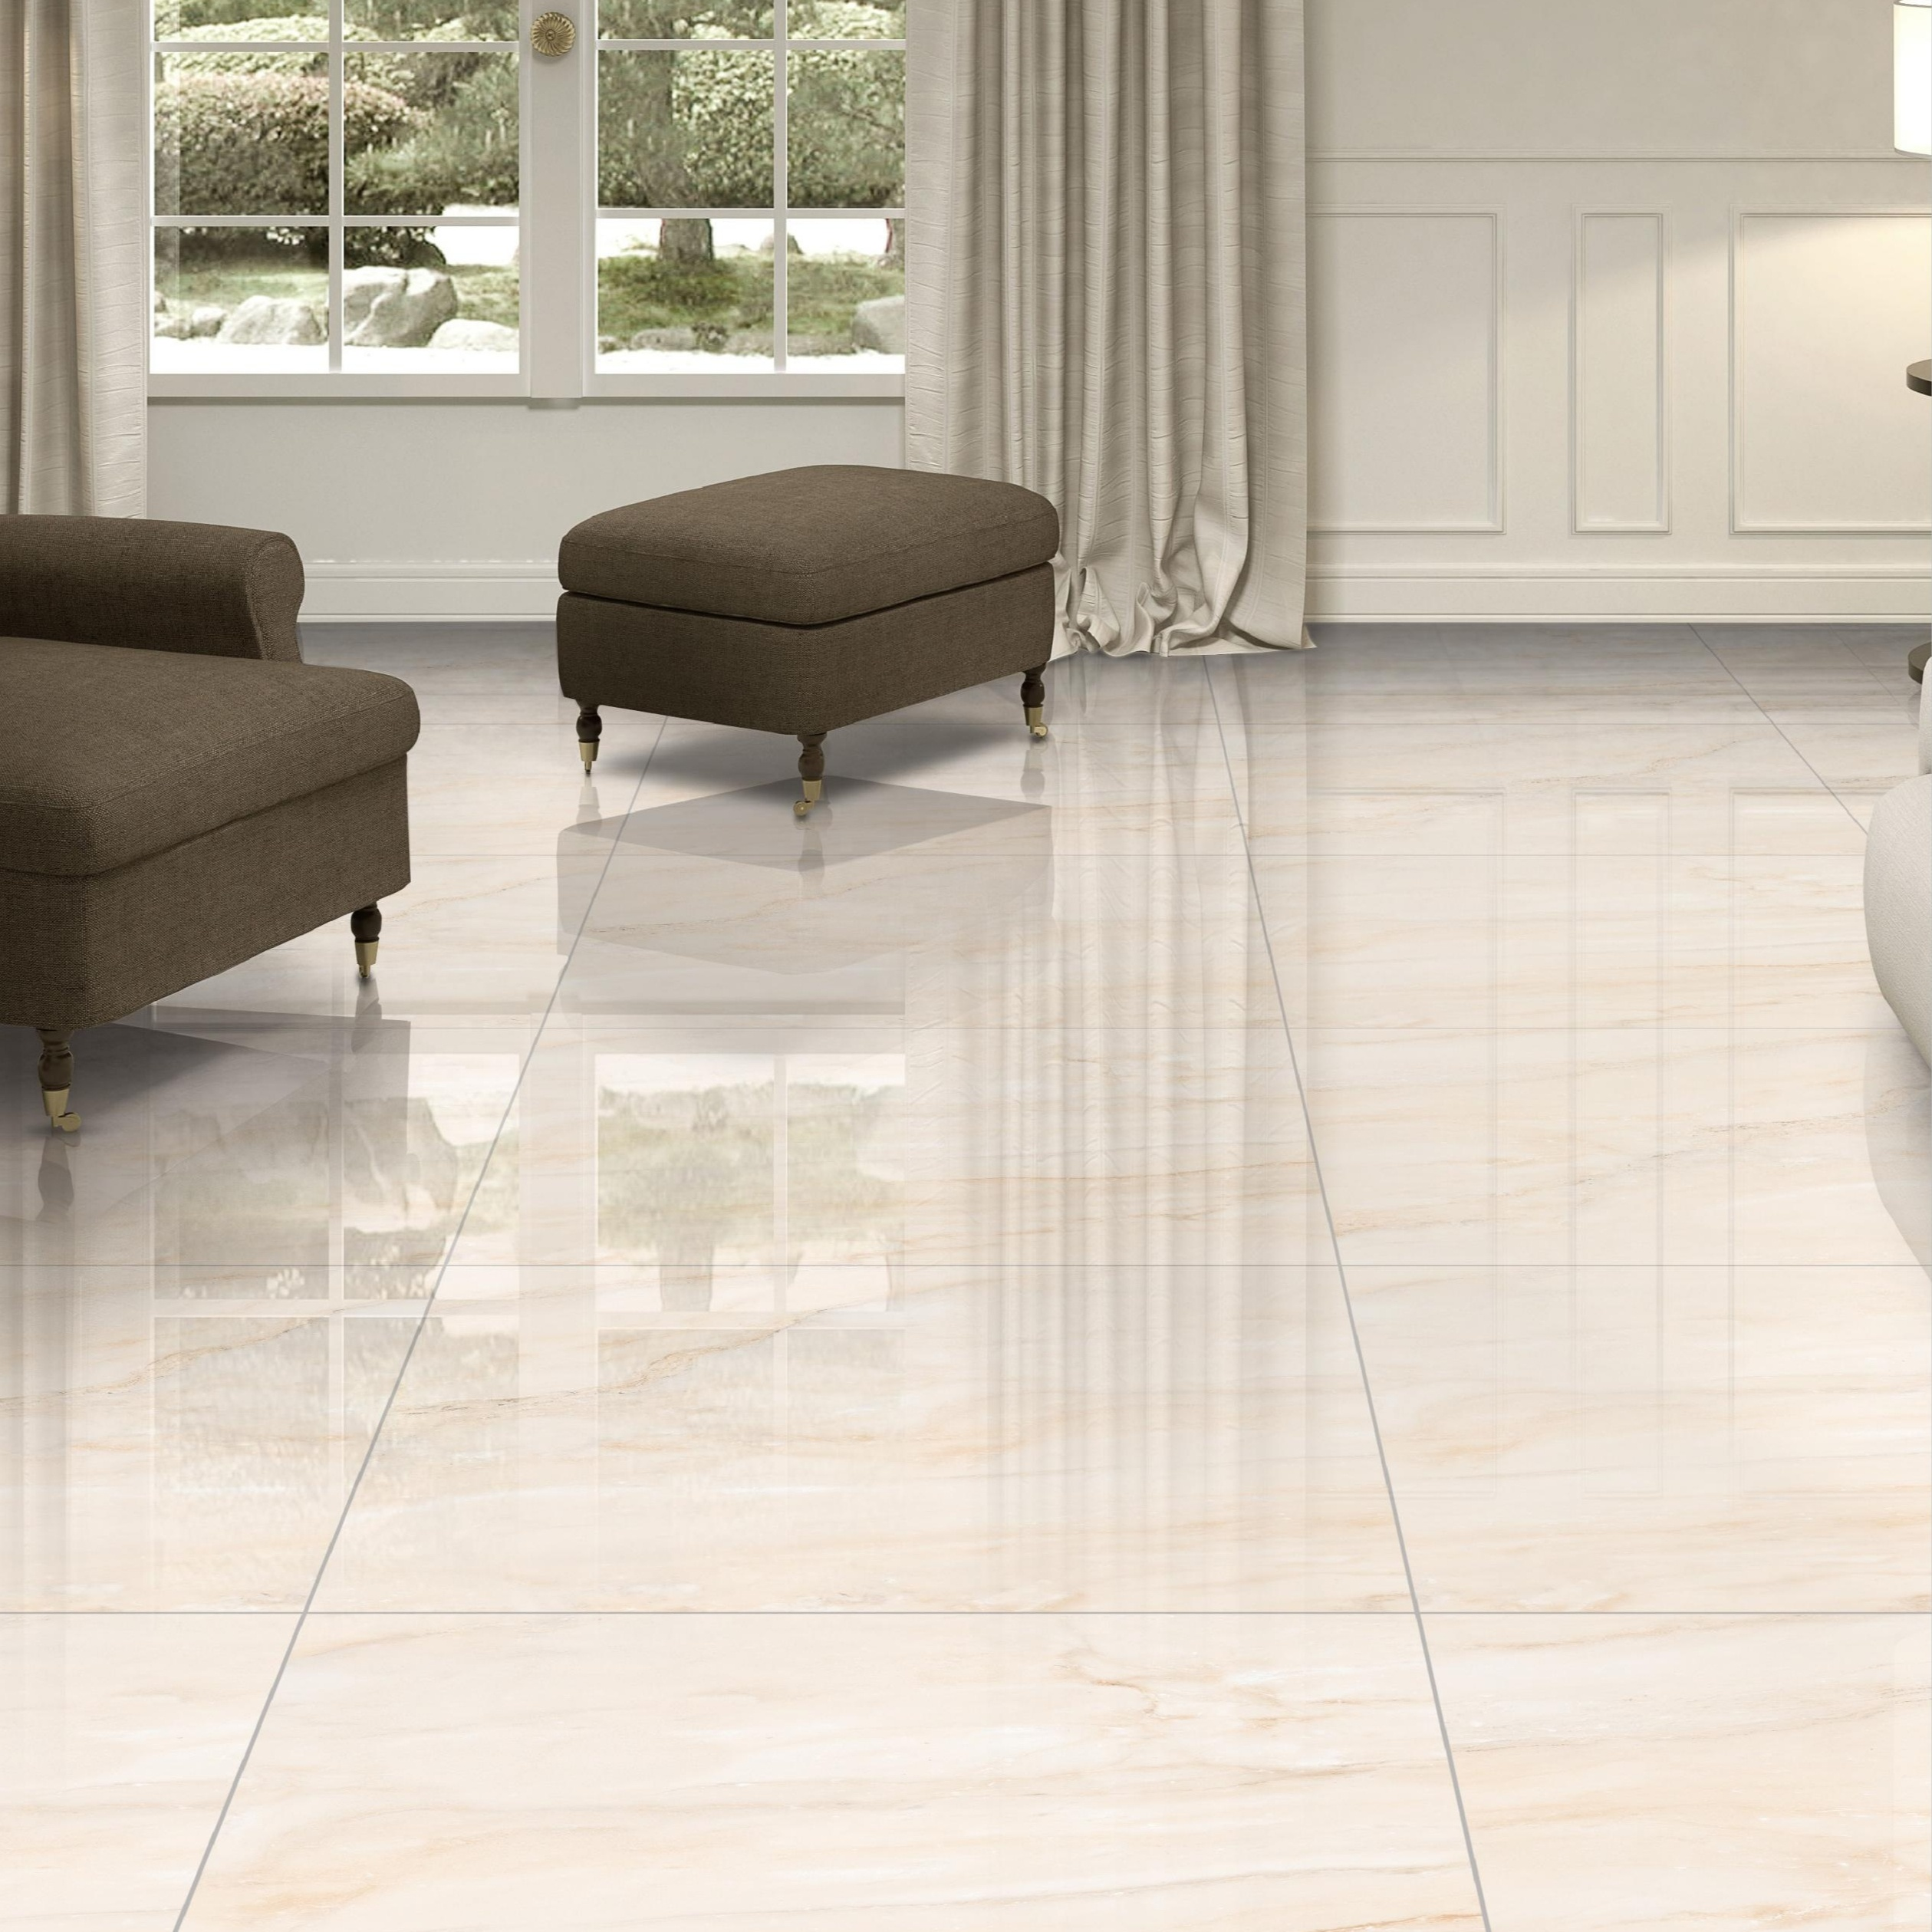 vistaar 60 x 60 corfu gris 24x24 glossy full polished glazed porcelain marble tile 2x2 floor 600x600mm for sale in best price buy pgvt tiles ceramic